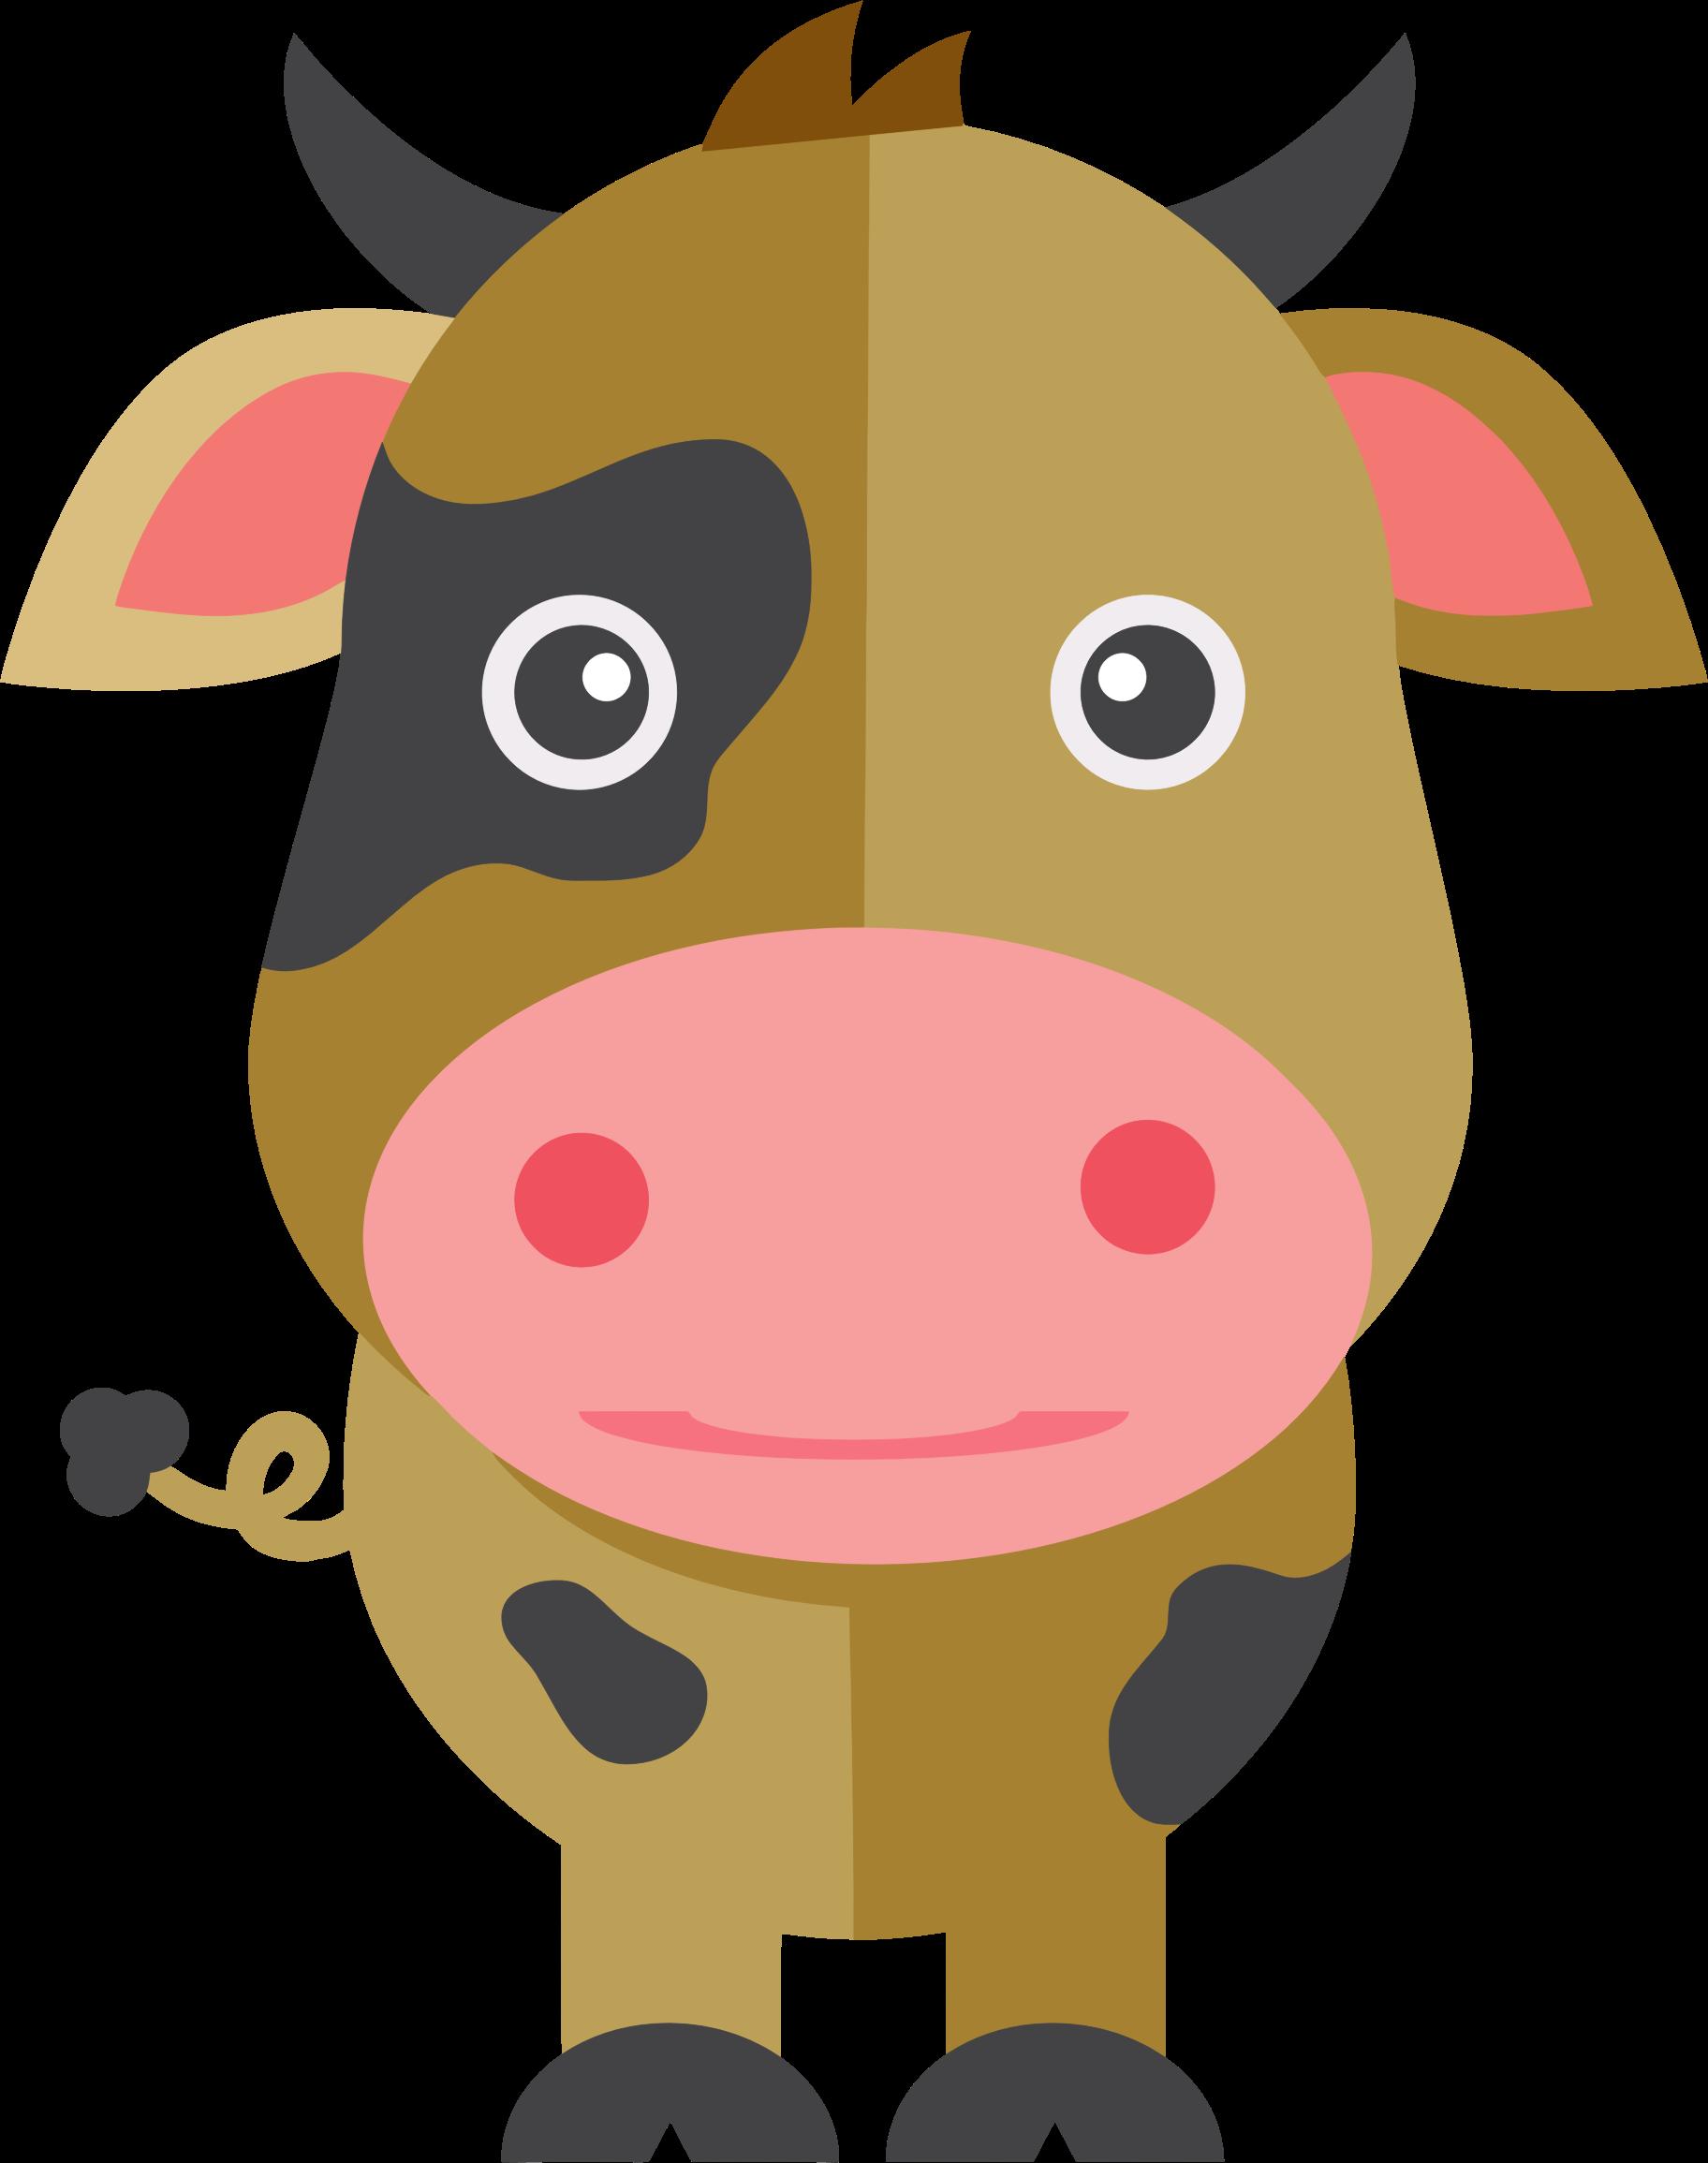 Cute big image png. Clipart cow cartoon